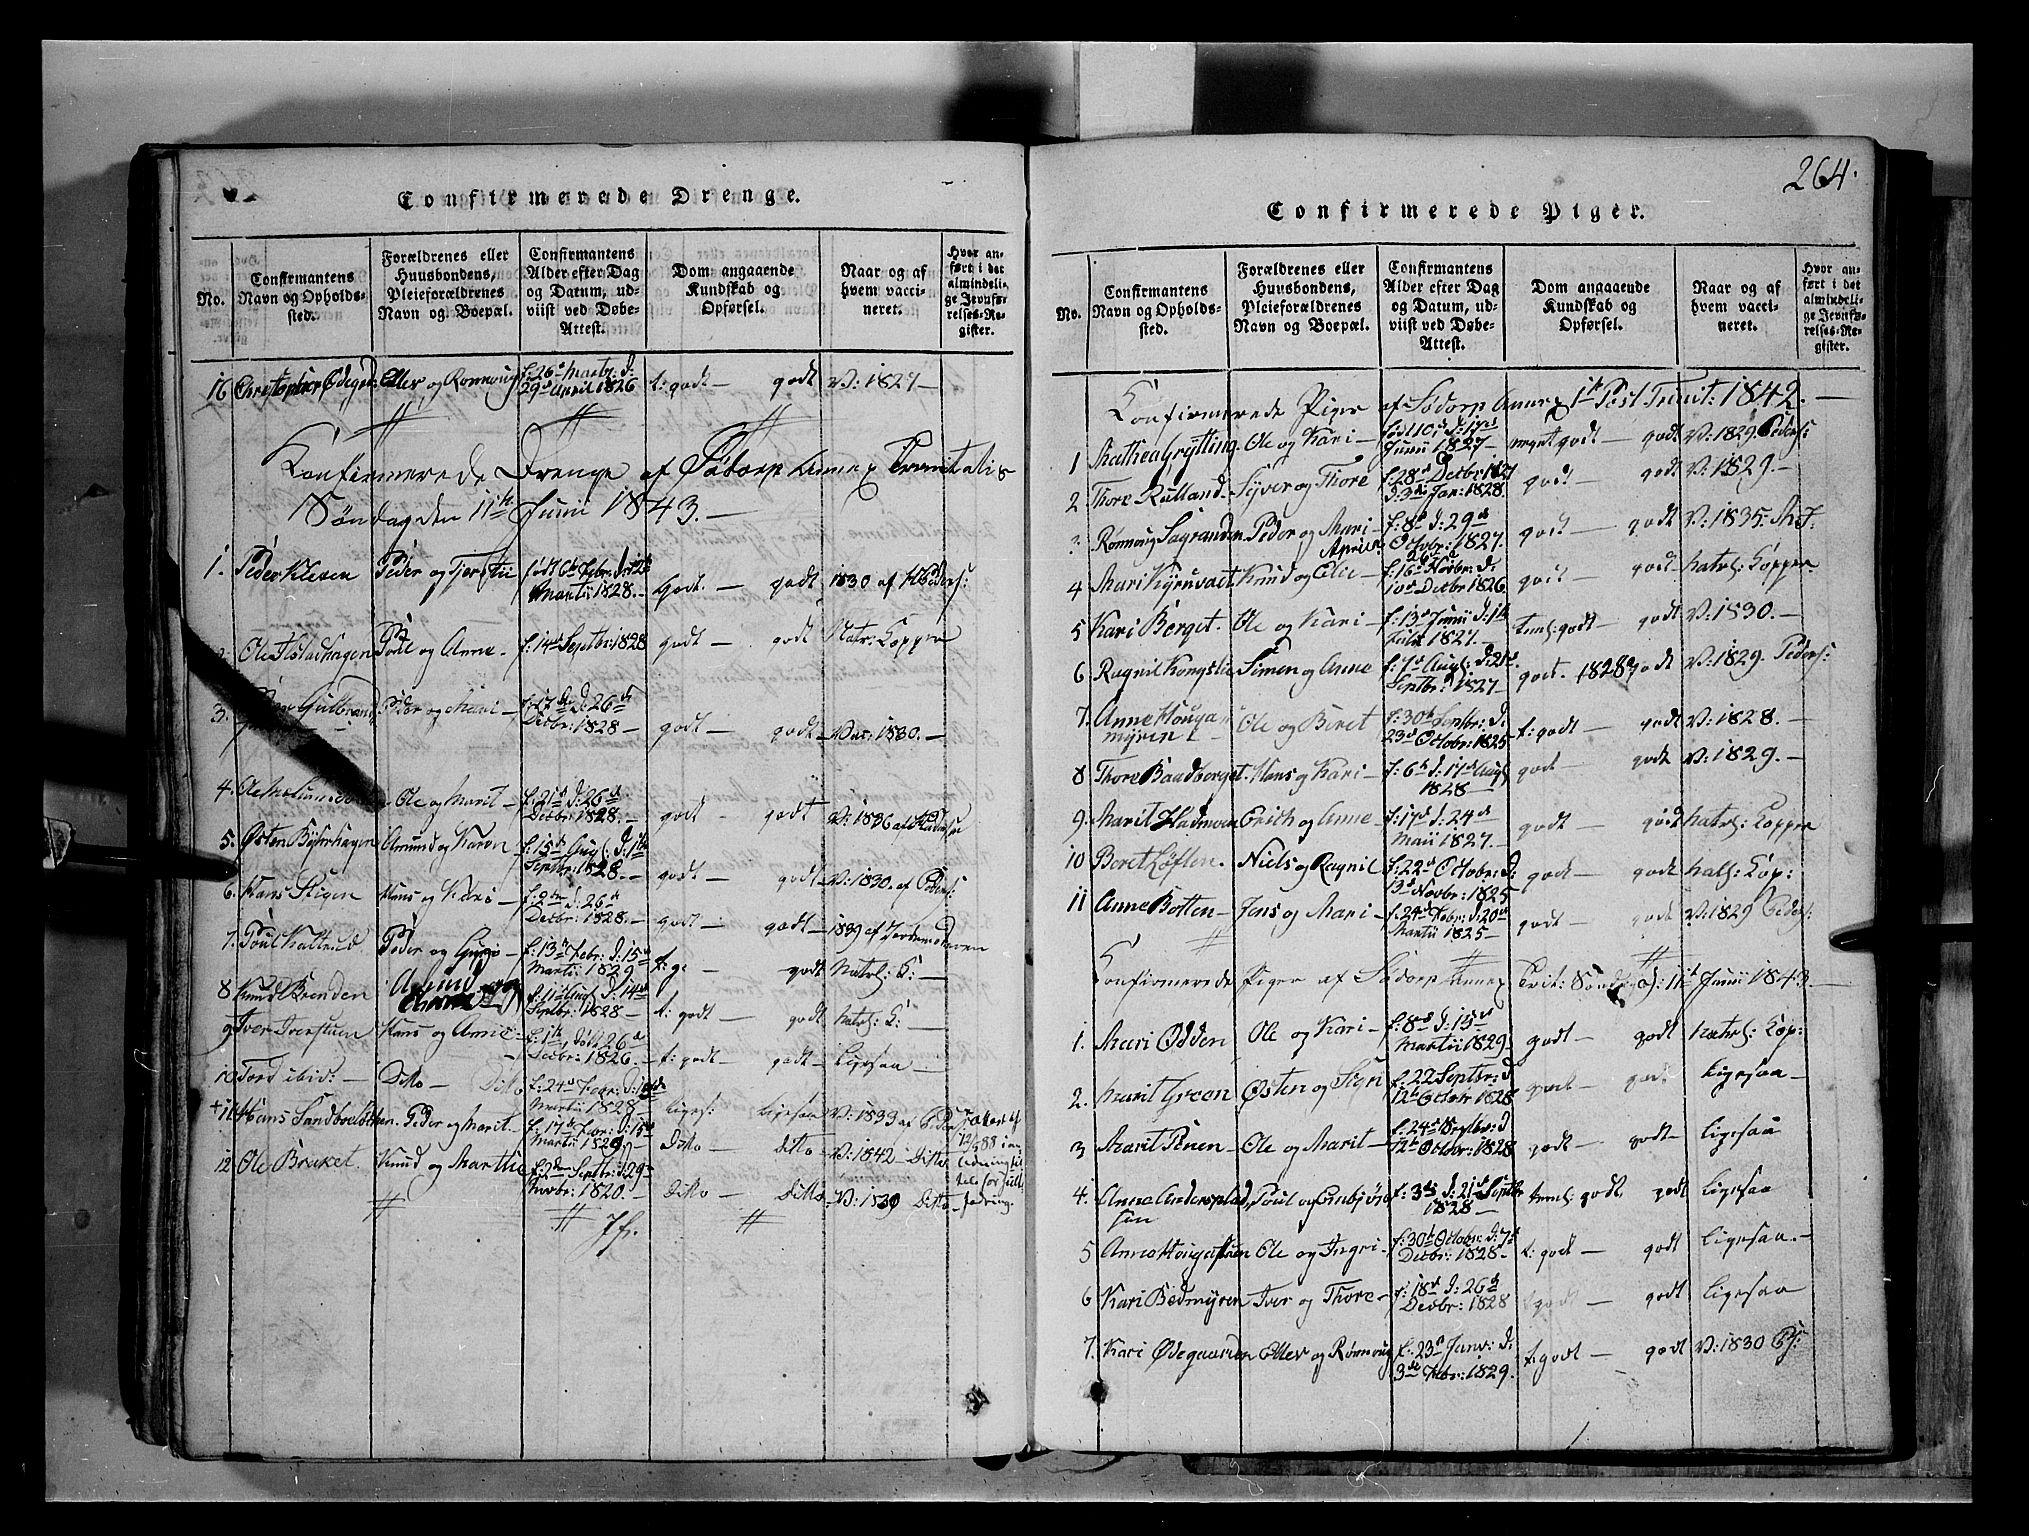 SAH, Fron prestekontor, H/Ha/Hab/L0004: Klokkerbok nr. 4, 1816-1850, s. 264